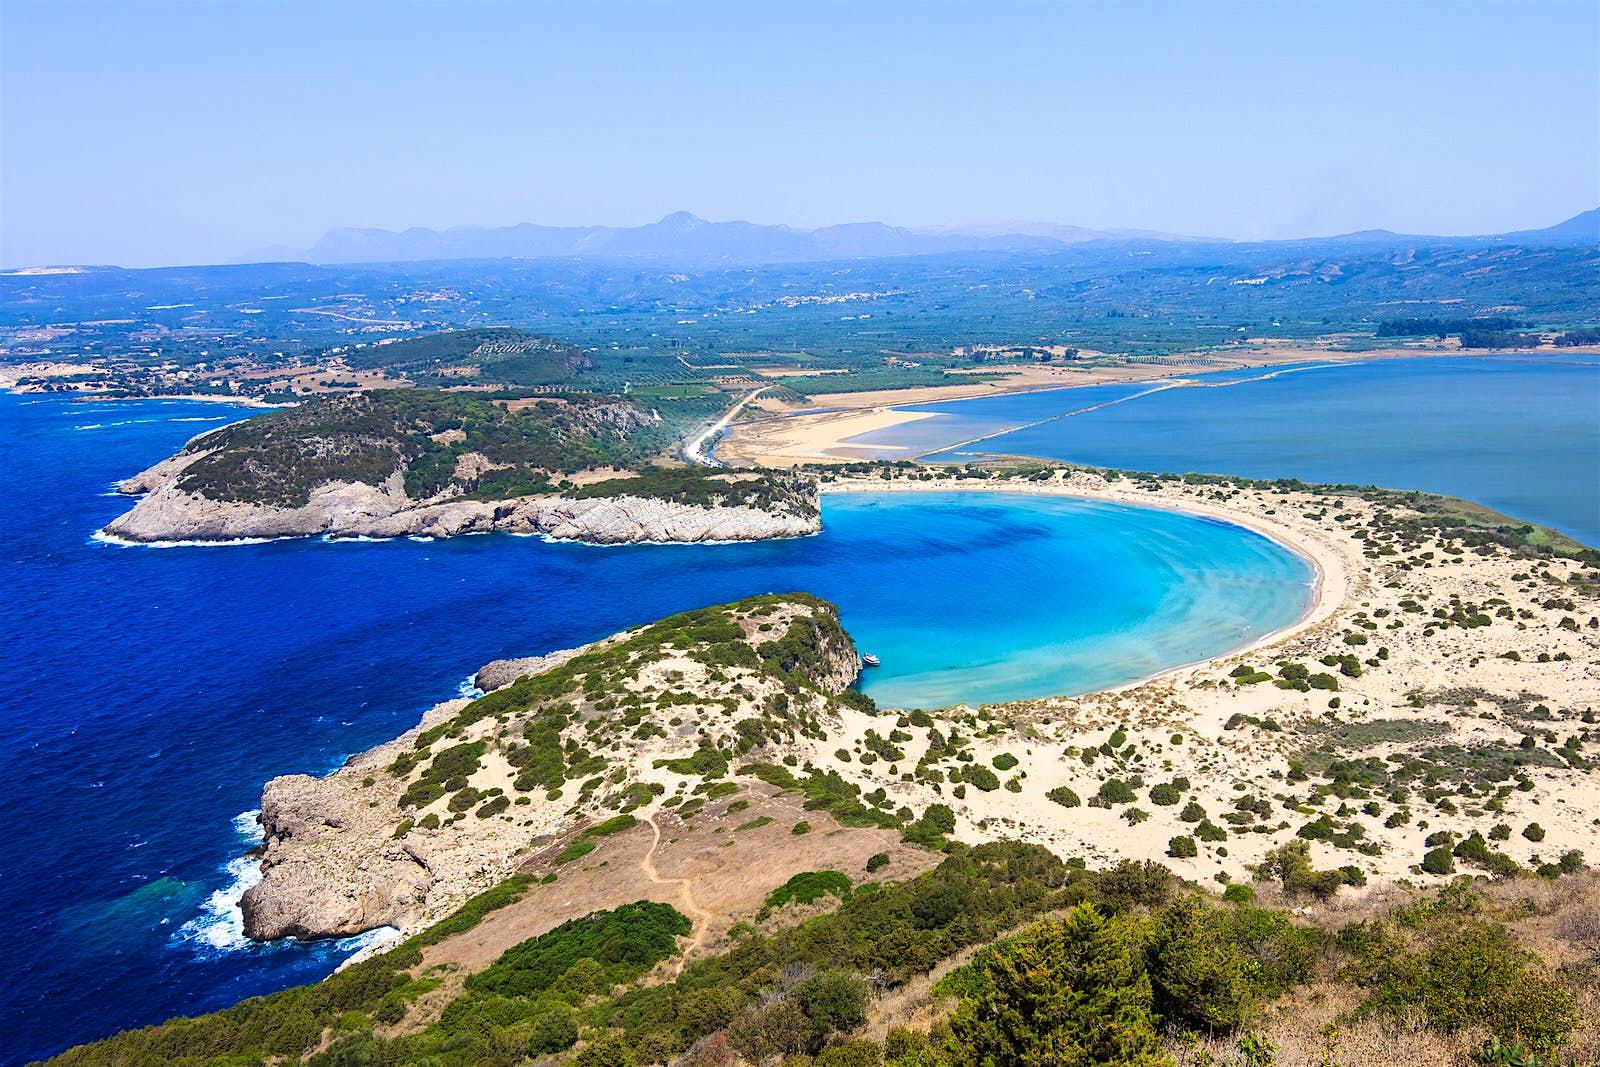 The lagoon of Voidokilia in the Bay of Navarino © Nick Pavlakis / Shutterstock